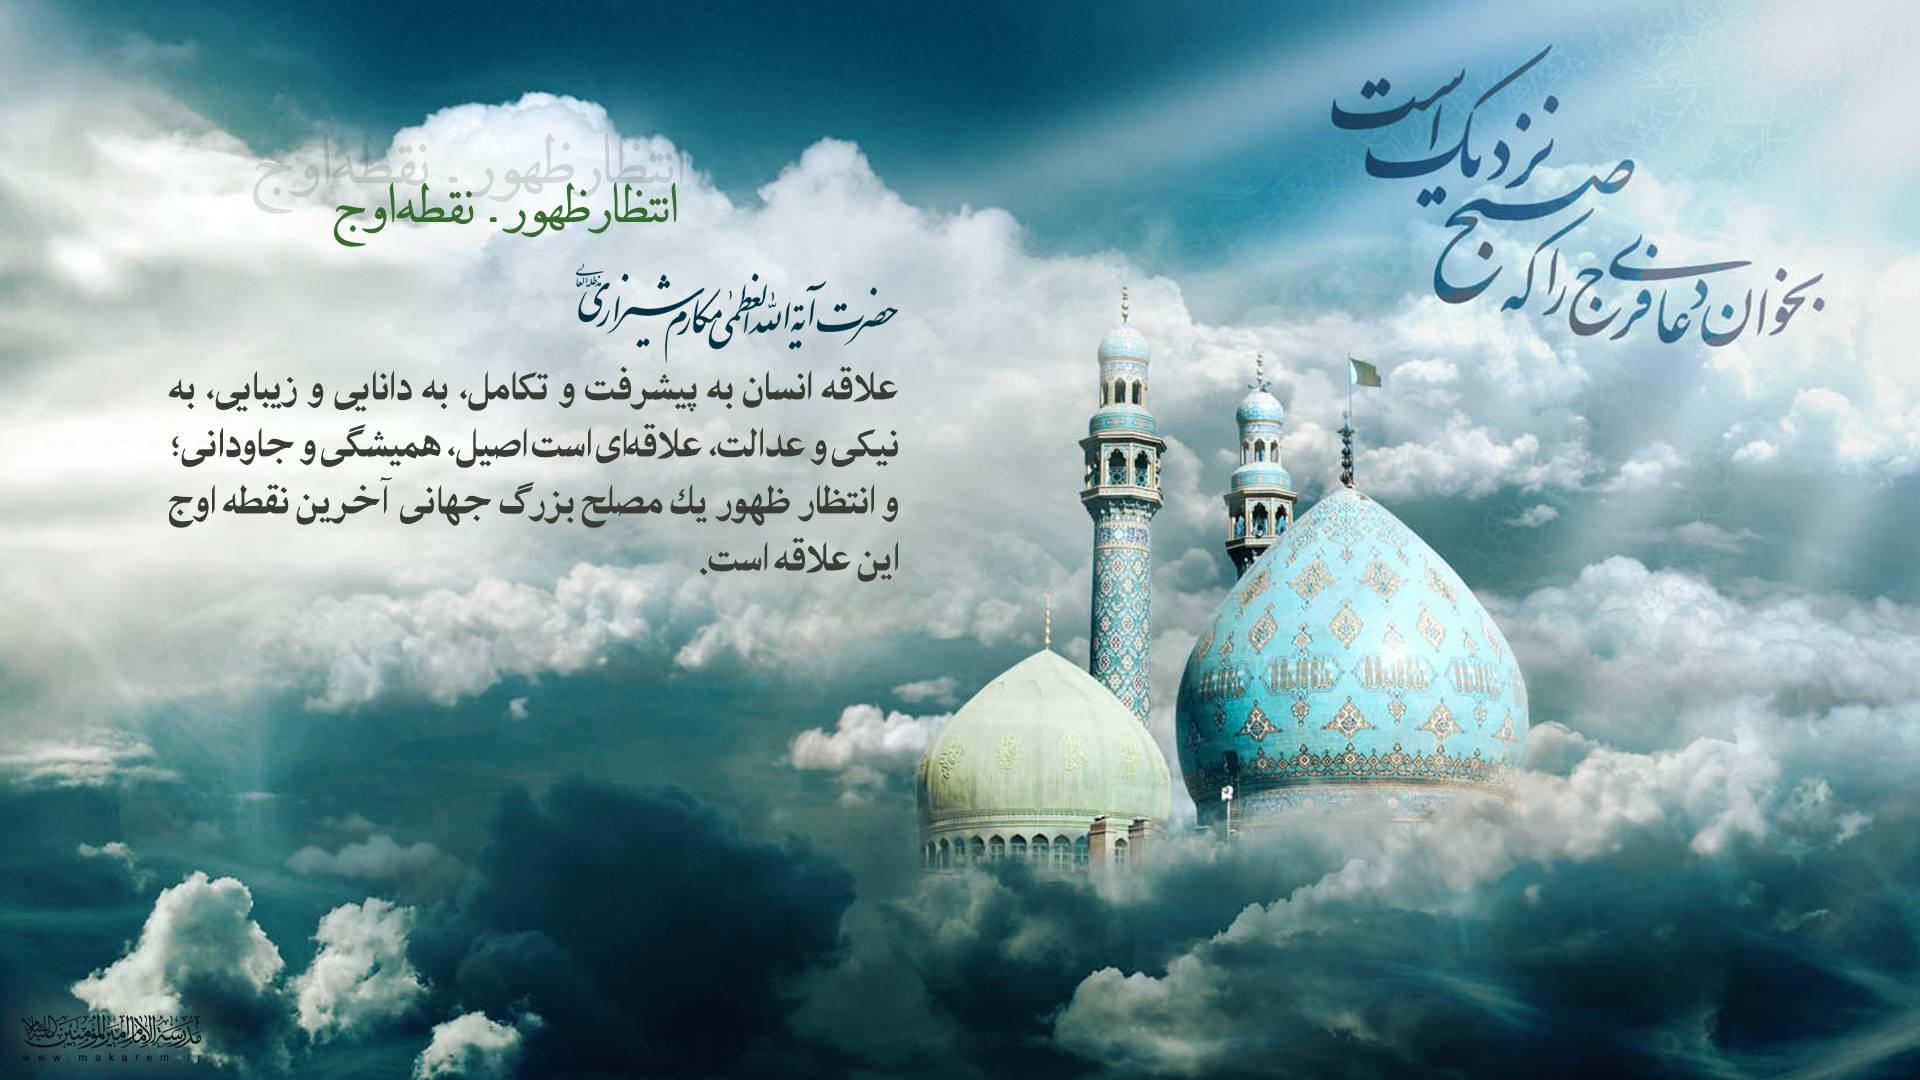 امام زمان 01-مدرسه الامام امیر المومنین (ع)